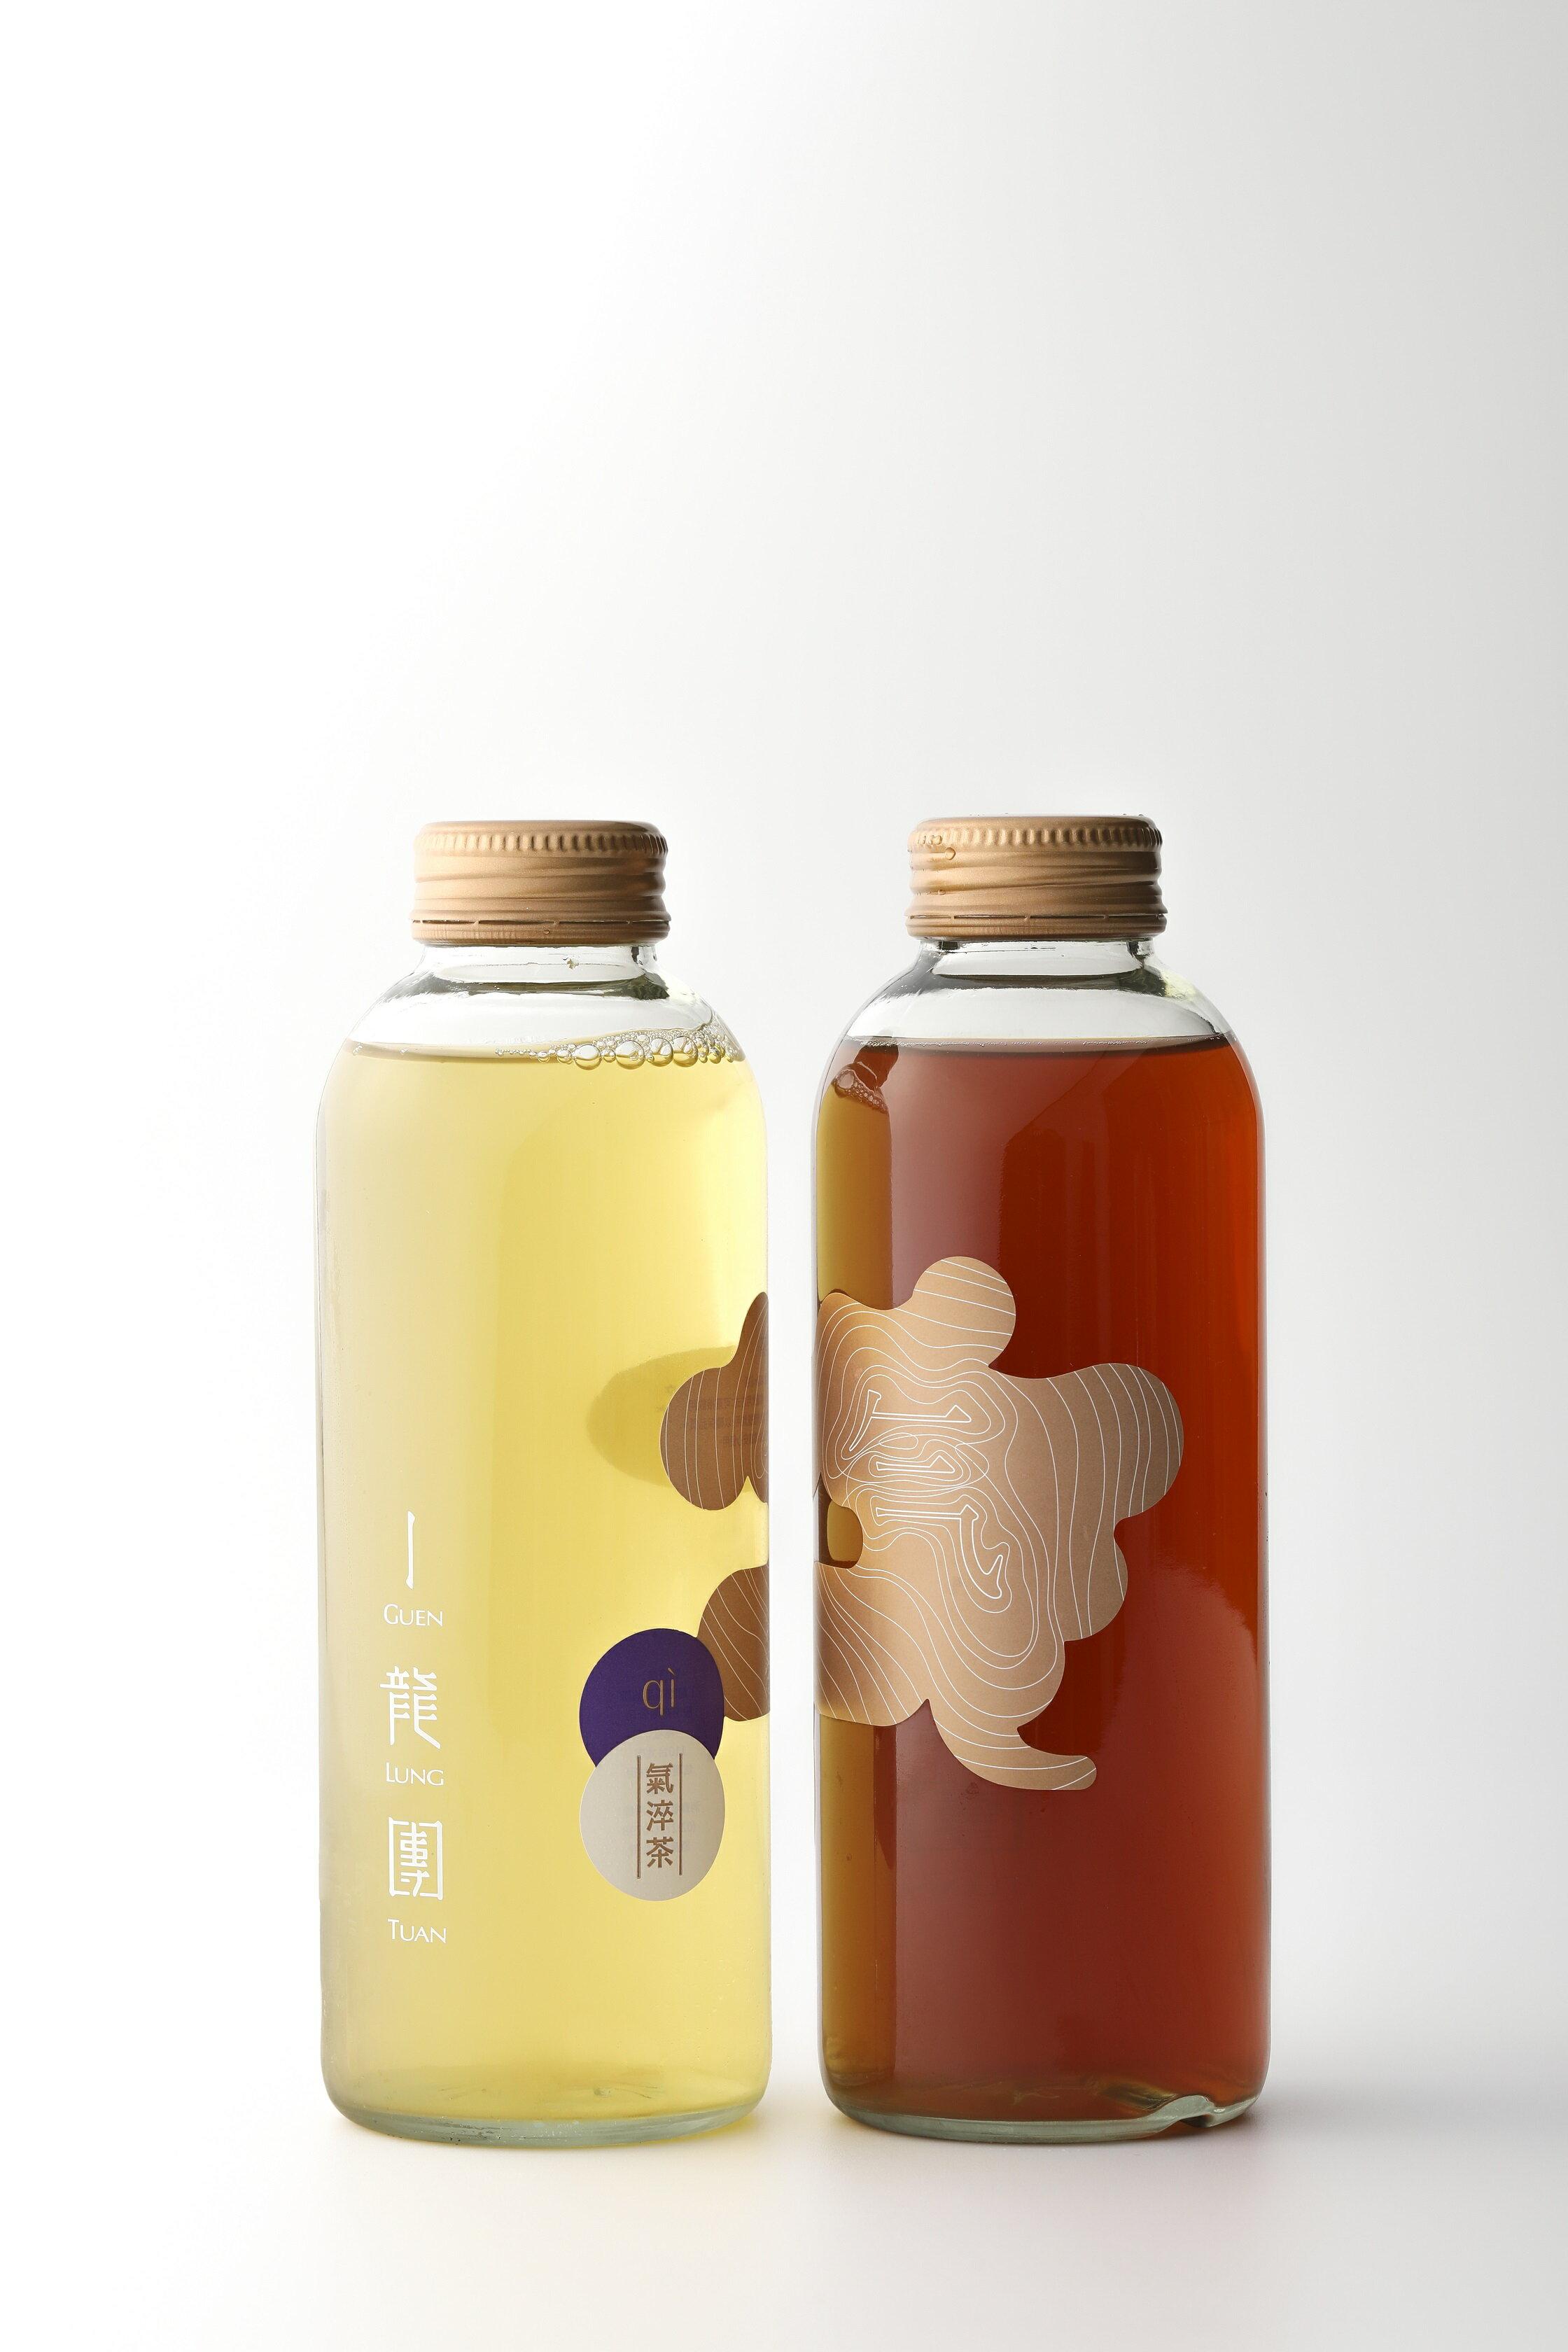 【菁淬茶】凍頂烏龍茶 - 早冬尋露 (500ml / 瓶) /Zao Dong Syun Lu/Dew in Early Winter 1